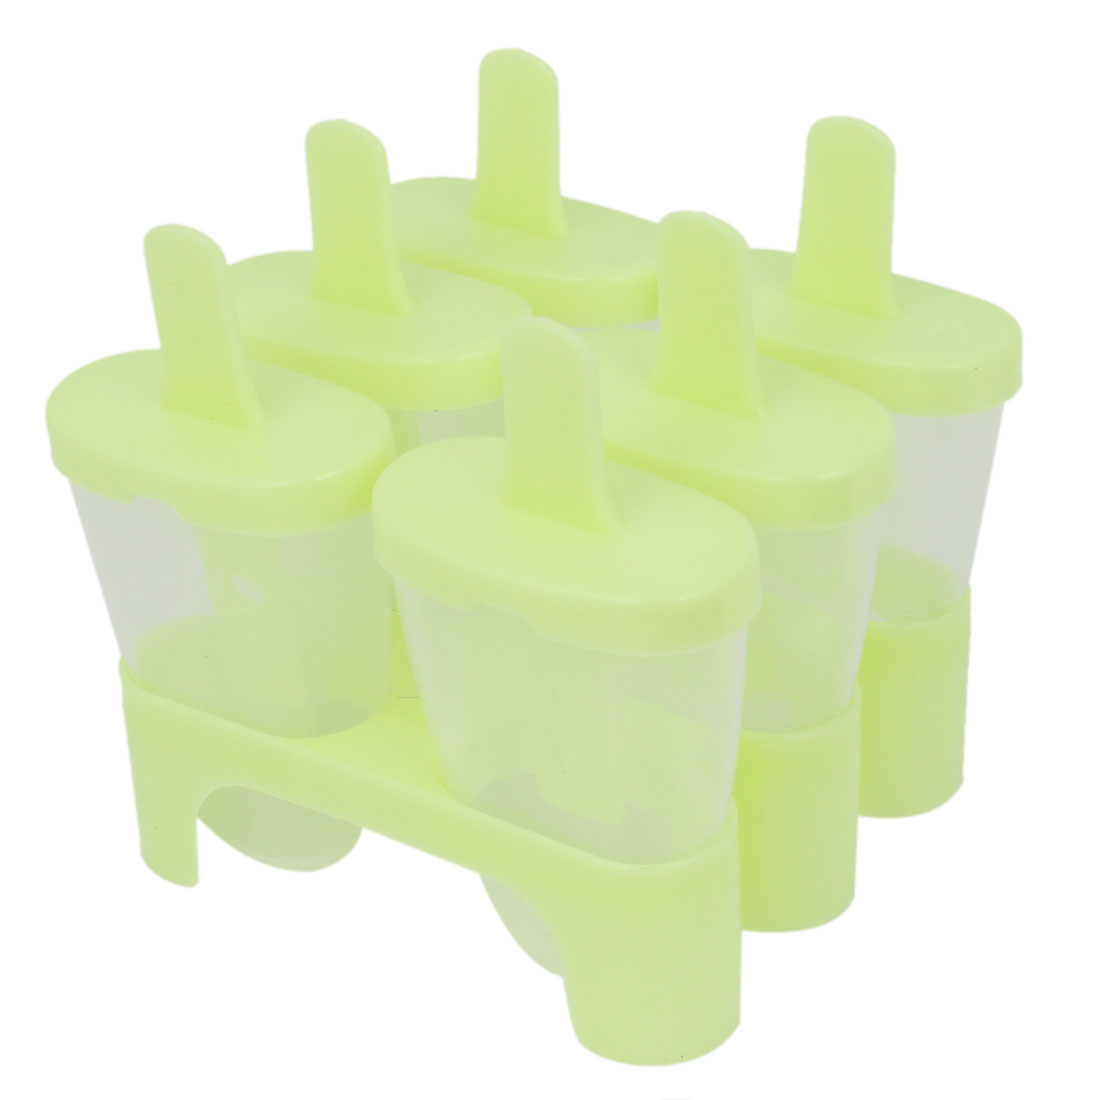 Home Plastic DIY Ice Candy Bar Mold Frozen Juice Frame Tray Sherbet Maker Green 6 Pcs